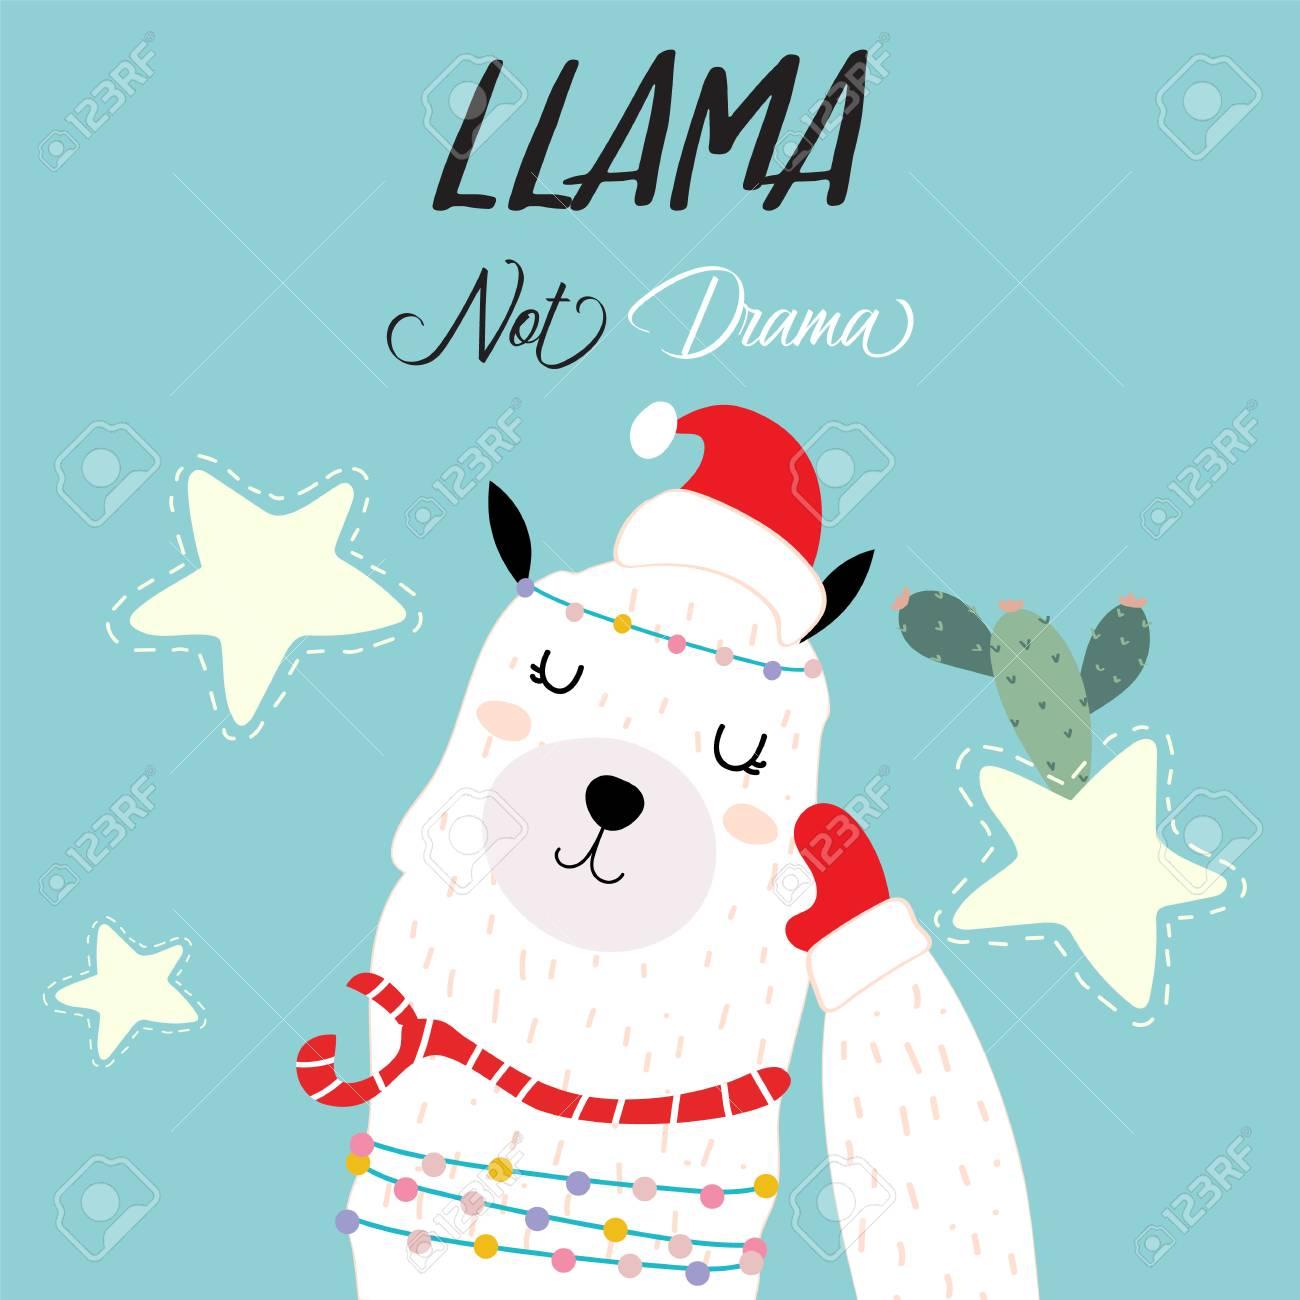 Christmas Llama.Blue Pink Hand Drawn Cute Card With Llama Cactus And Star In